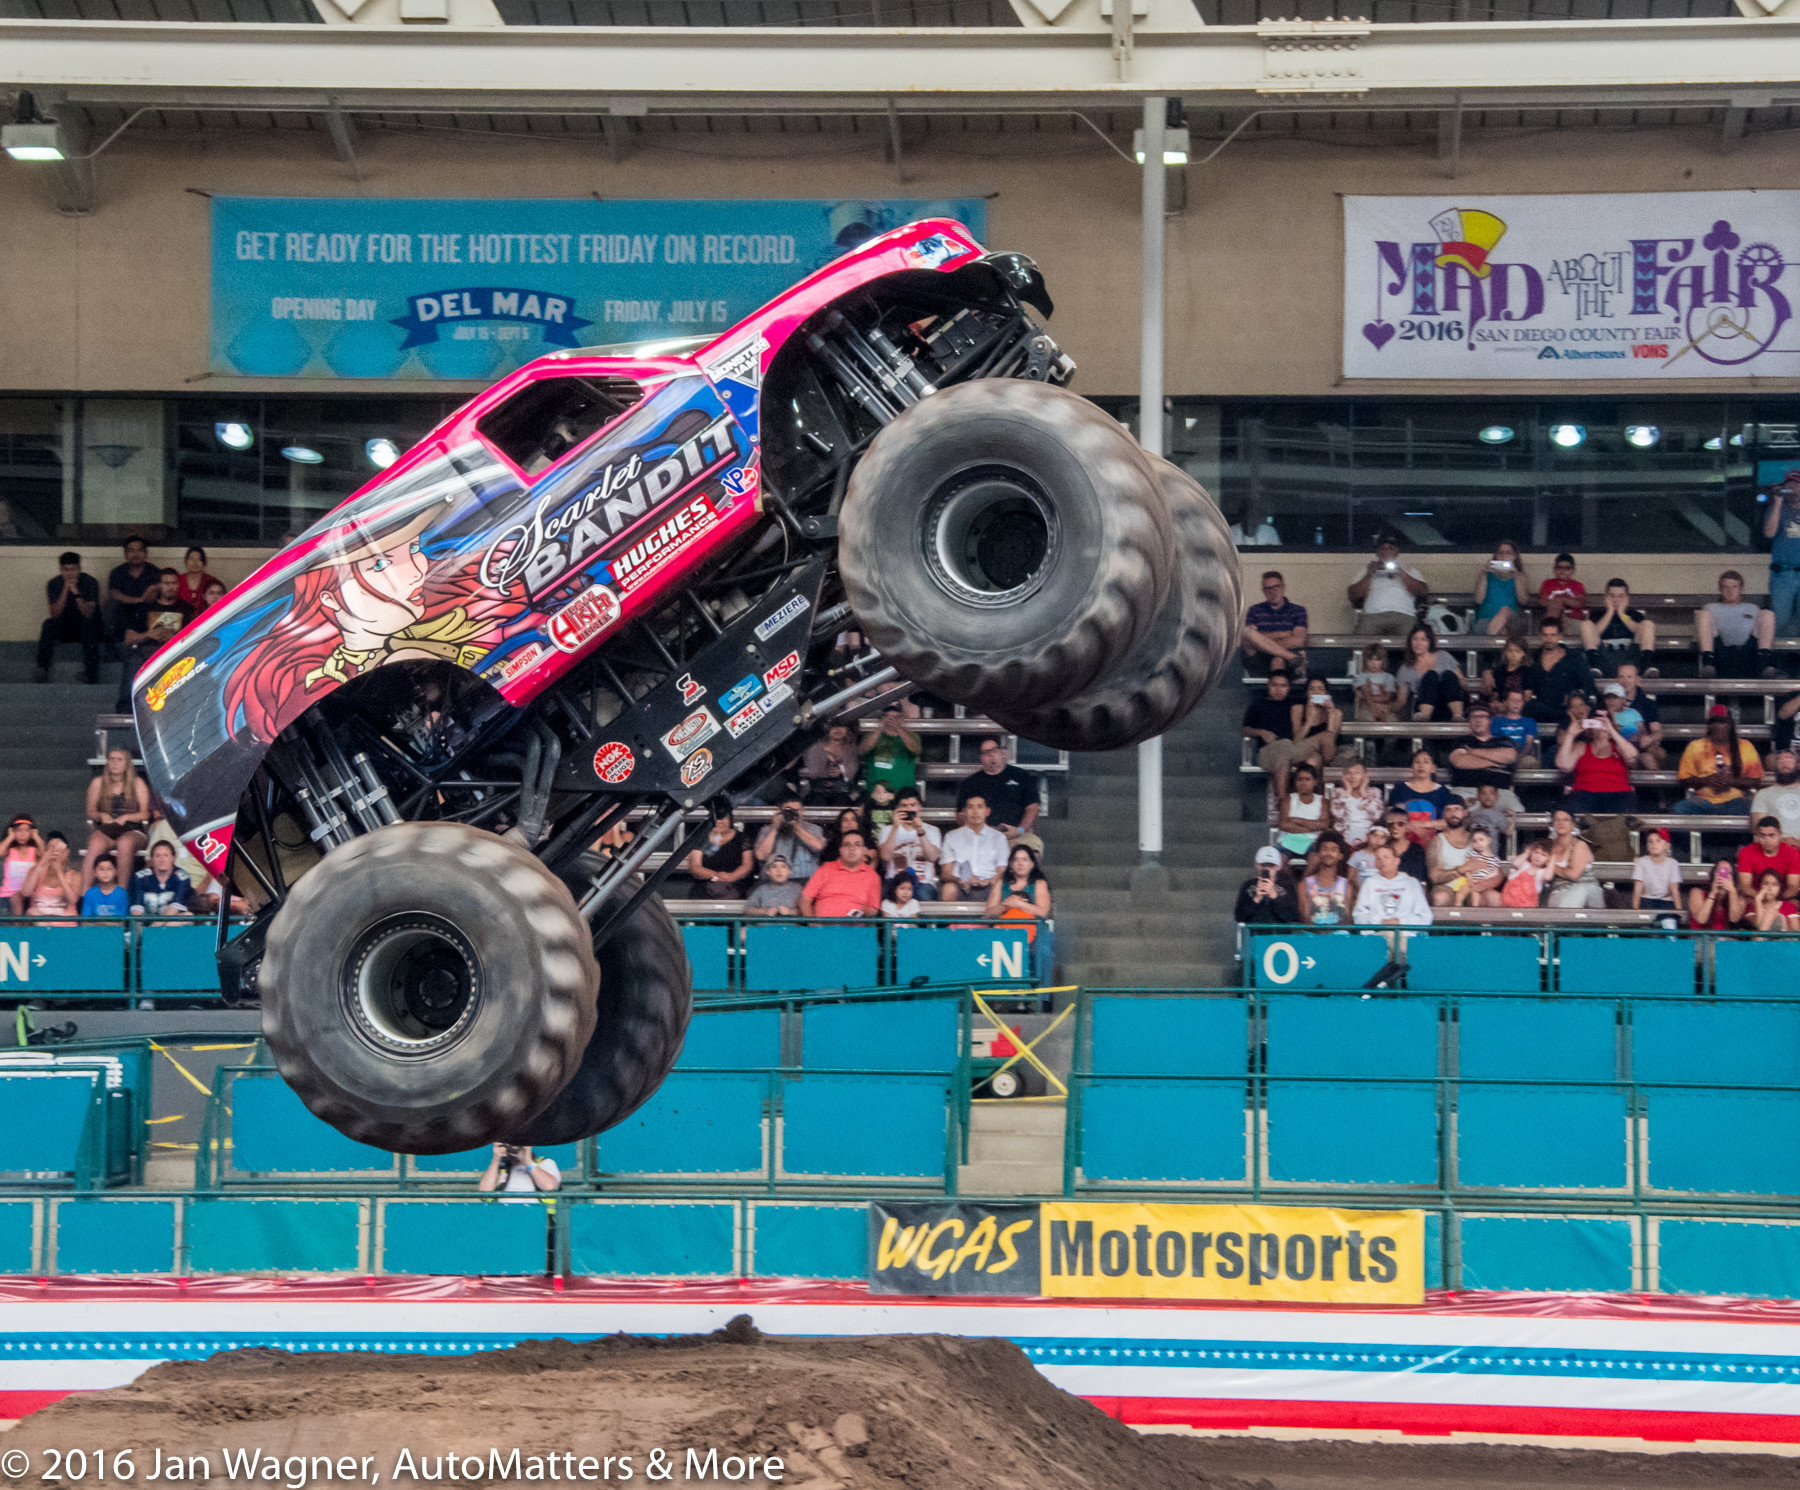 Motorsports fair